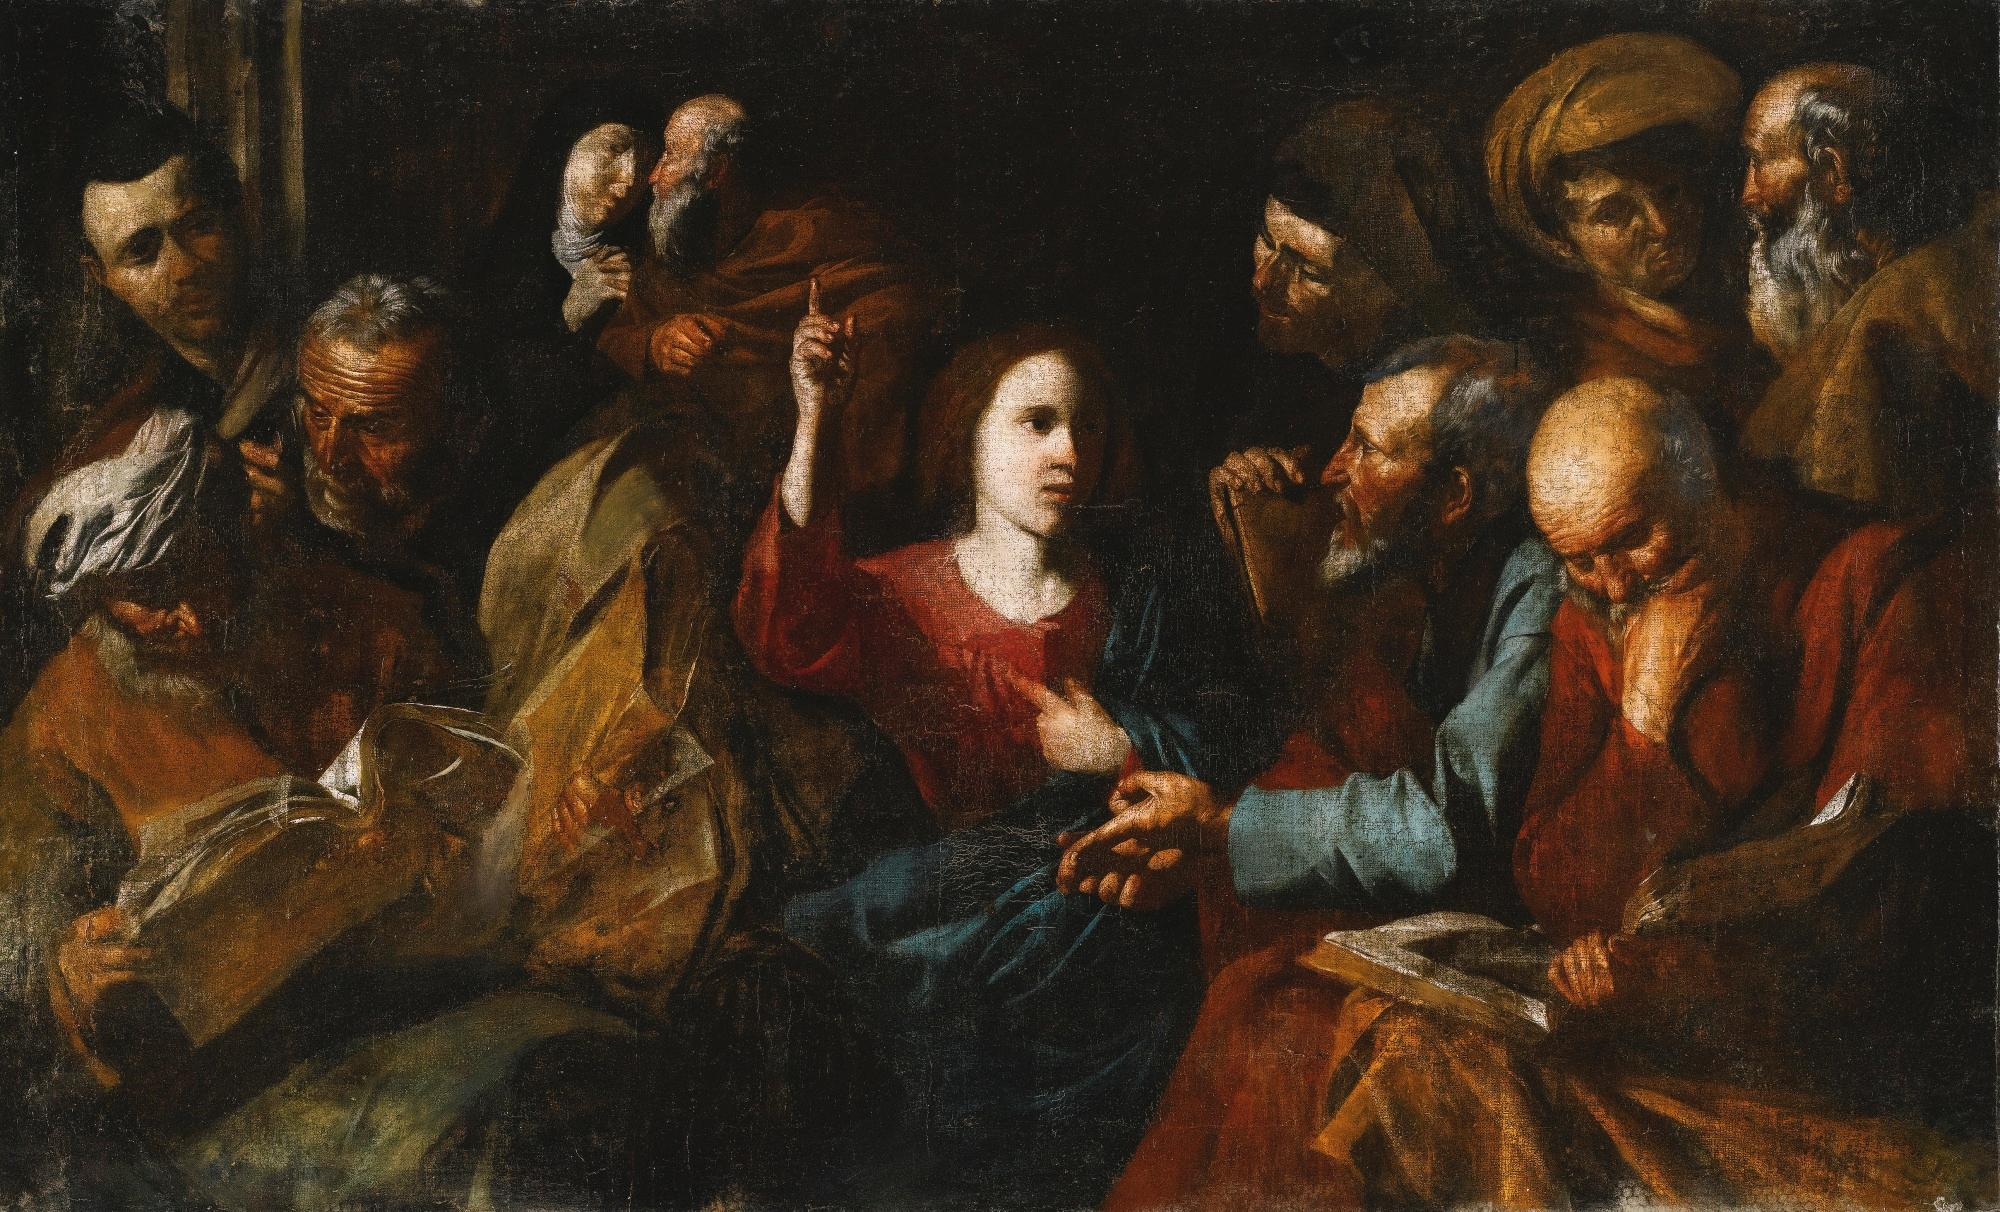 File:Christ Among The Doctors (Ribera).jpg - Wikimedia Commons